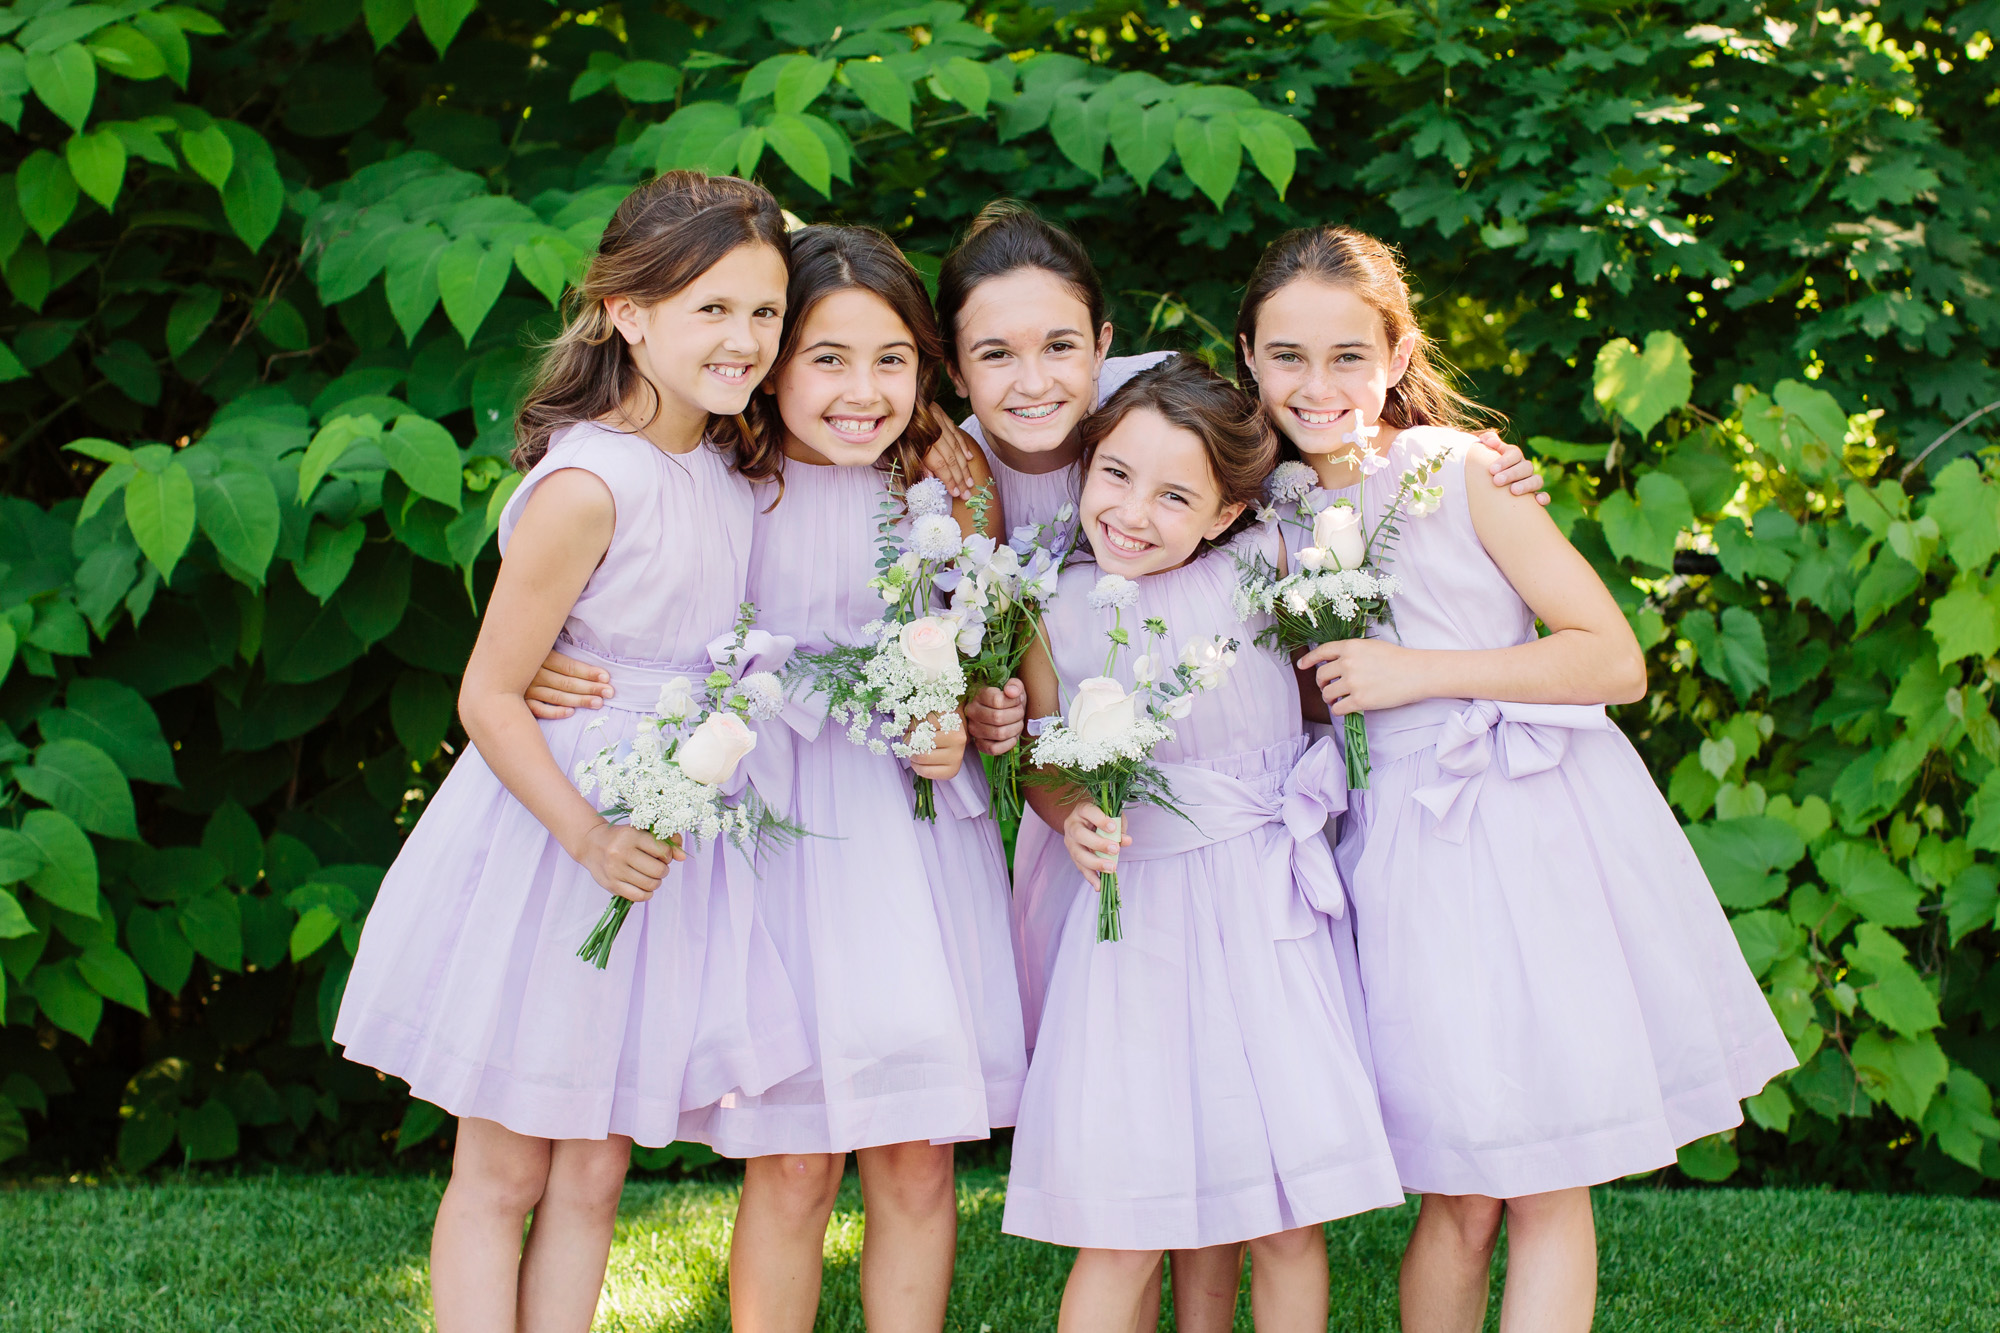 39_Rowan_Brian_The_Roundhouse_Wedding_Beacon_NY_Tanya_Salazar_Photography_442.jpg